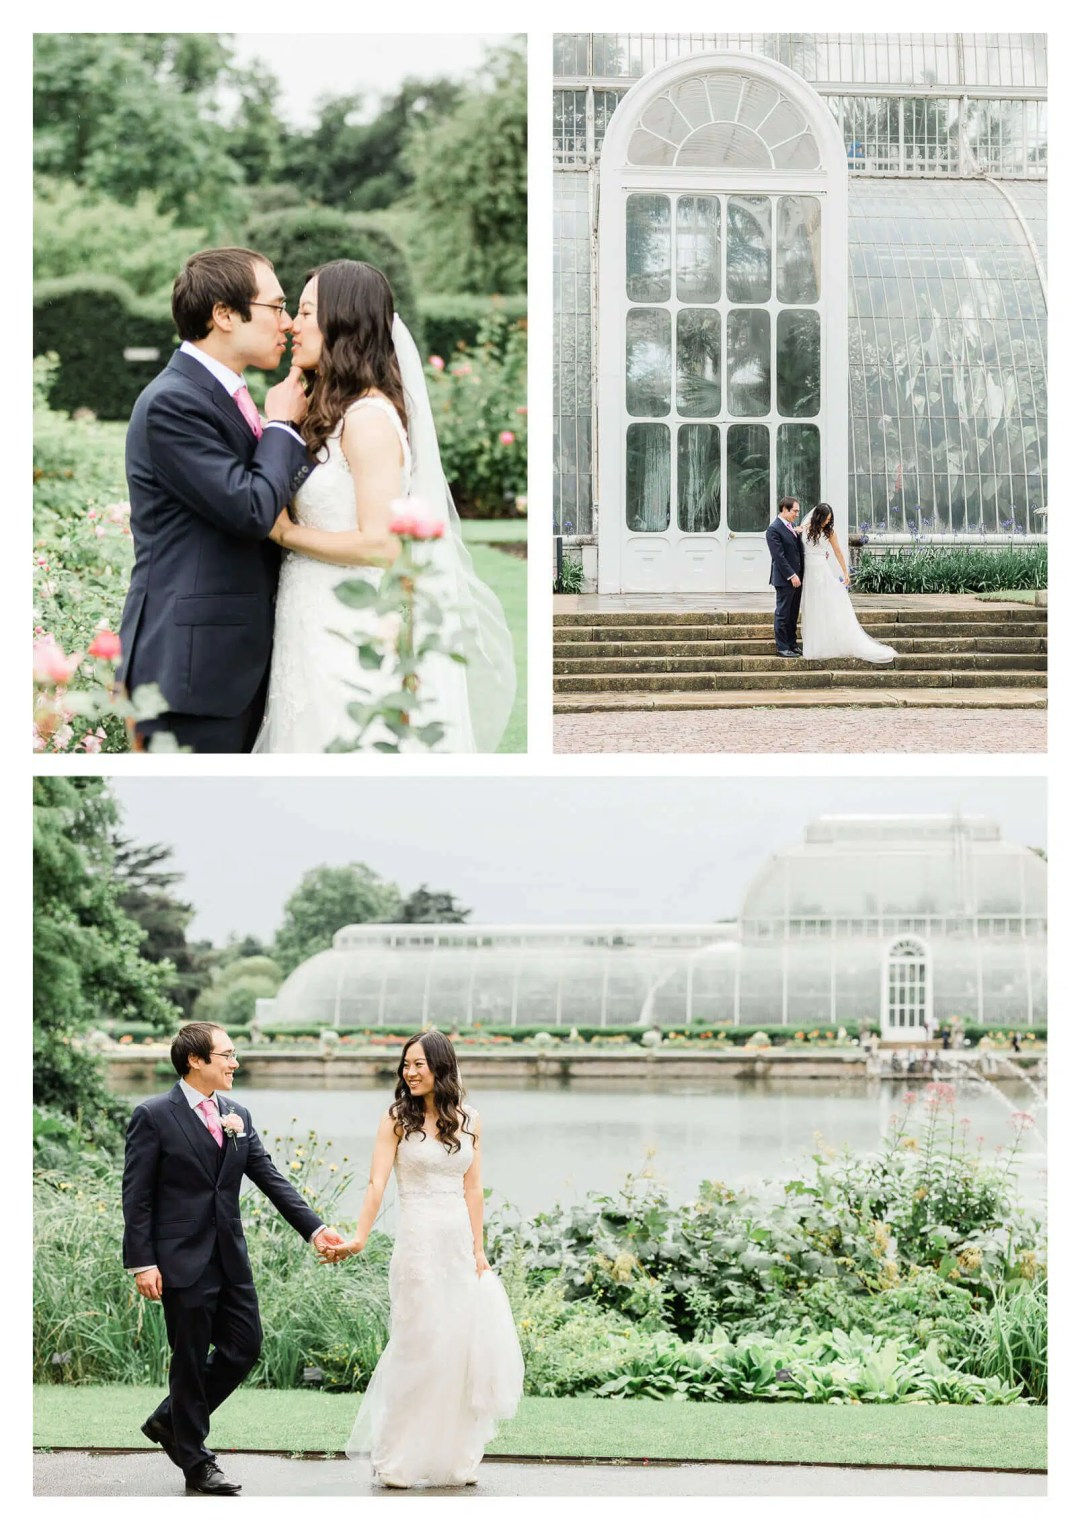 Kew Garden wedding couple portraits in rose garden | London photographer